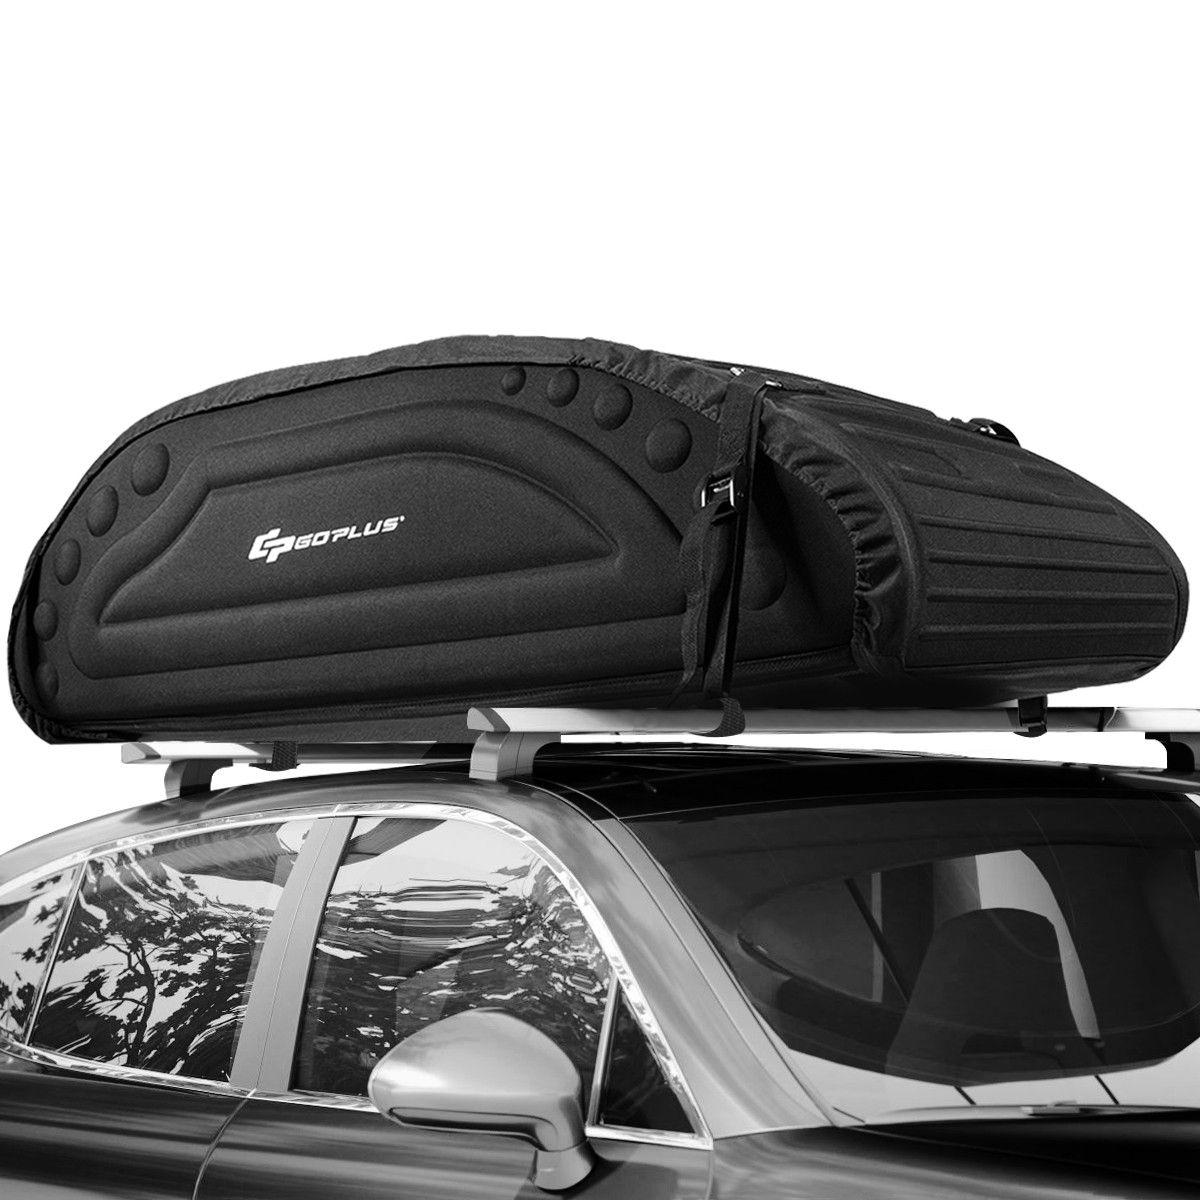 15 Cubic Feet Roof Bag Waterproof Top Cargo Carrier